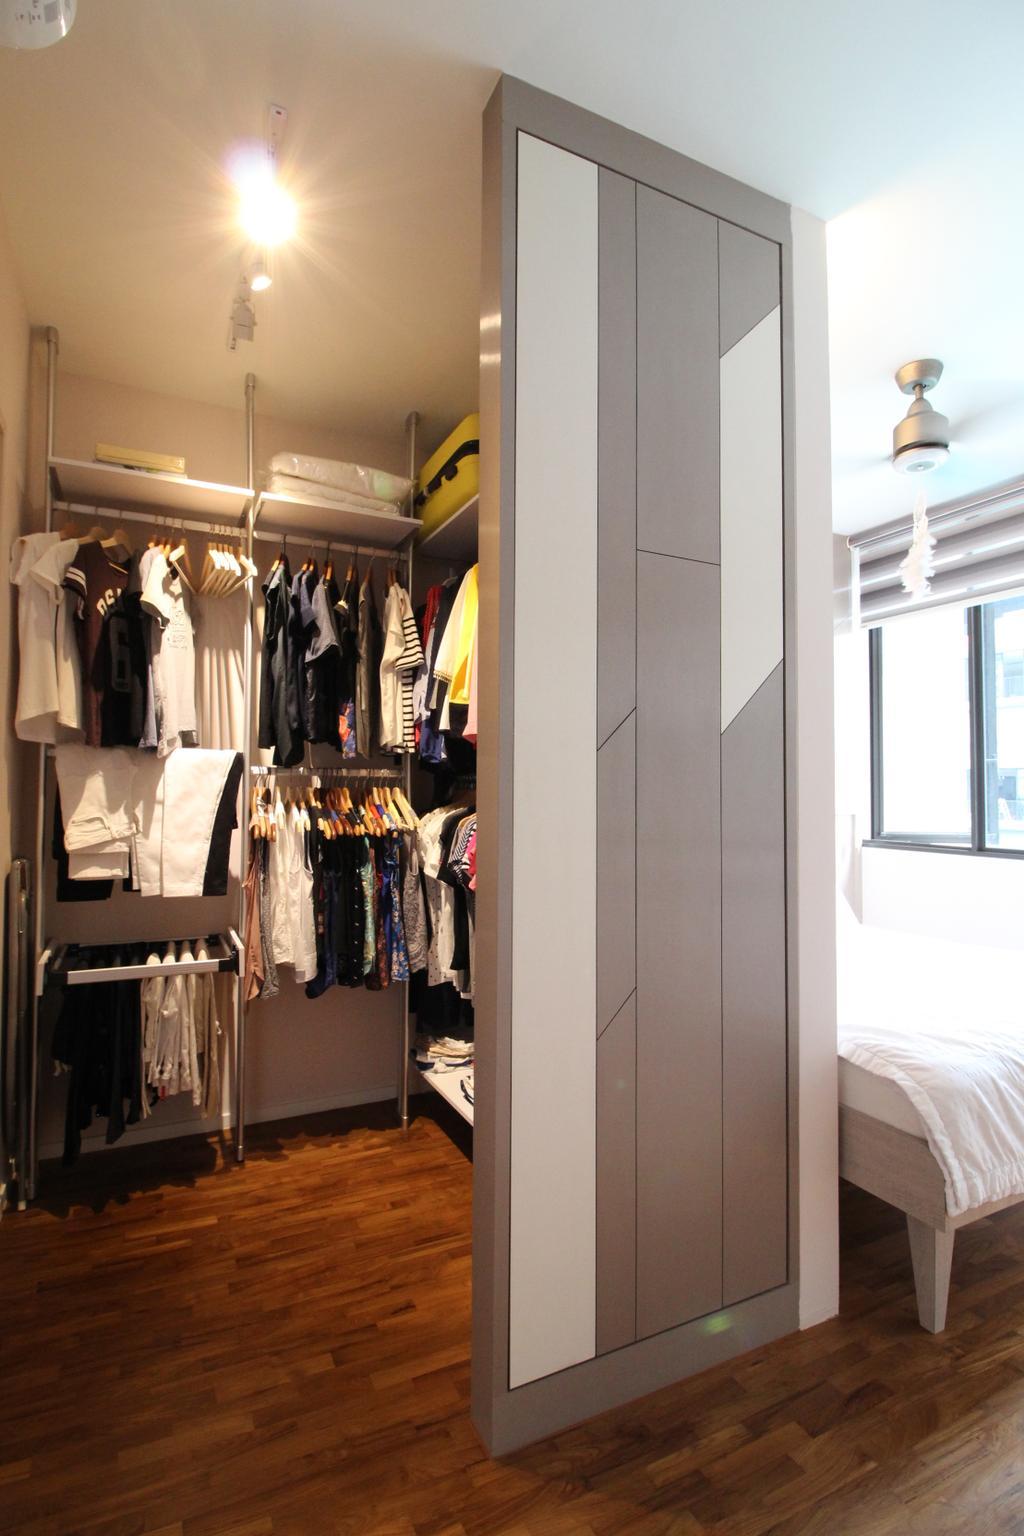 Condo, The Amore, Interior Designer, Aestherior, Apparel, Clothing, Closet, Light Fixture